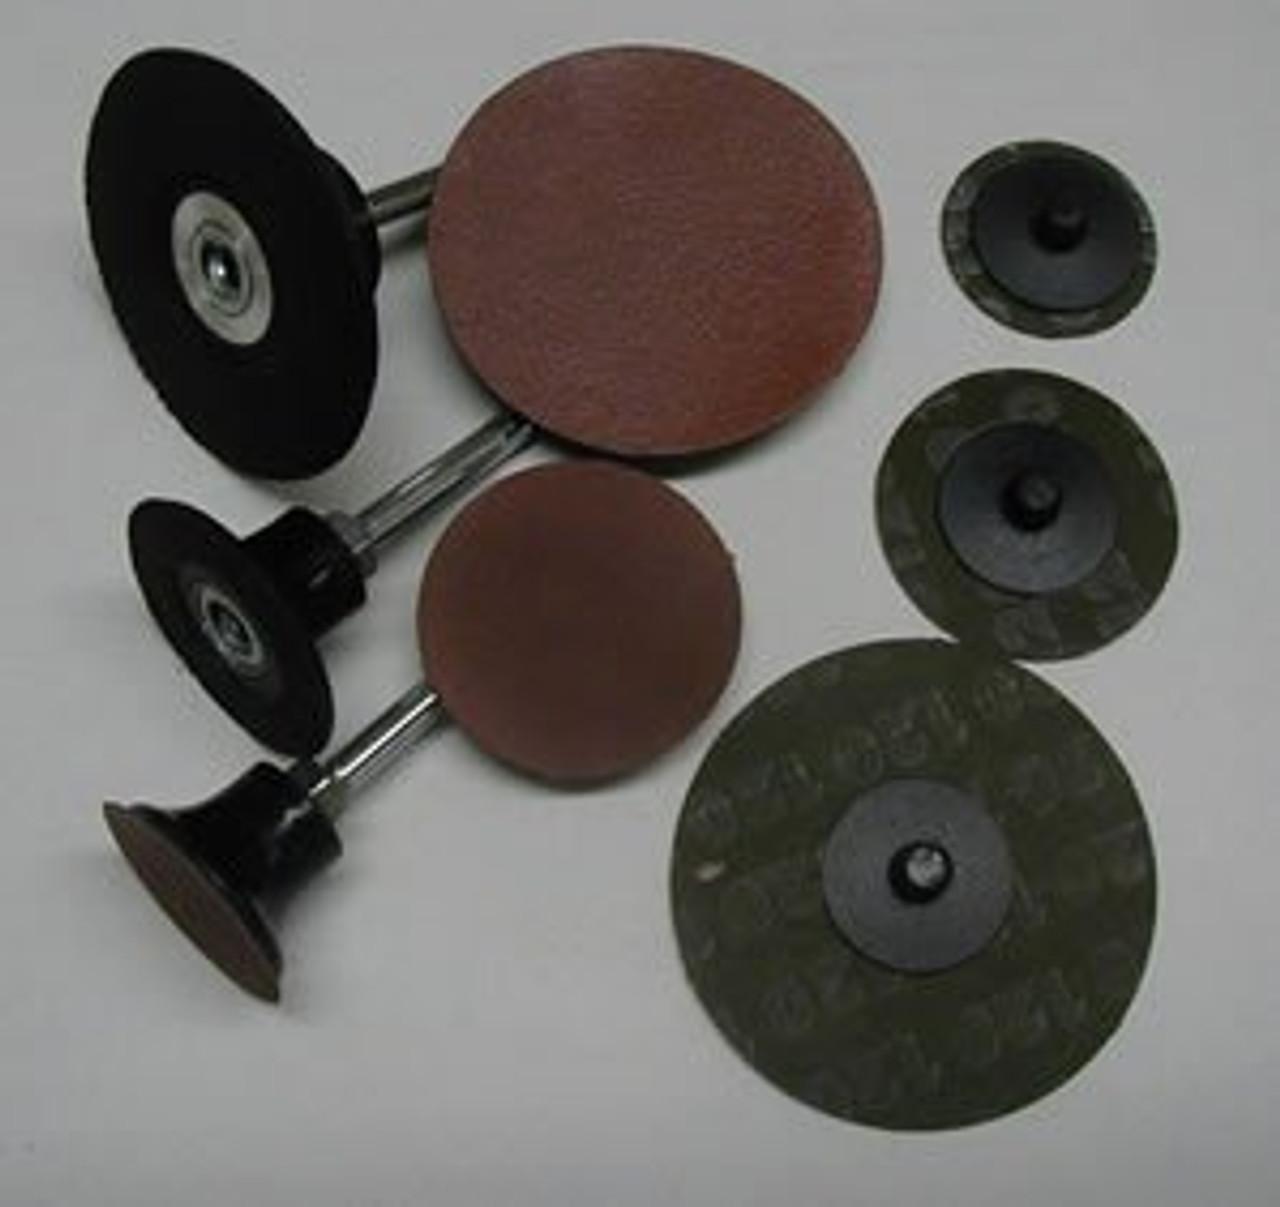 "Aluminum Oxide Sanding Disk 3"" - 100 Grit"